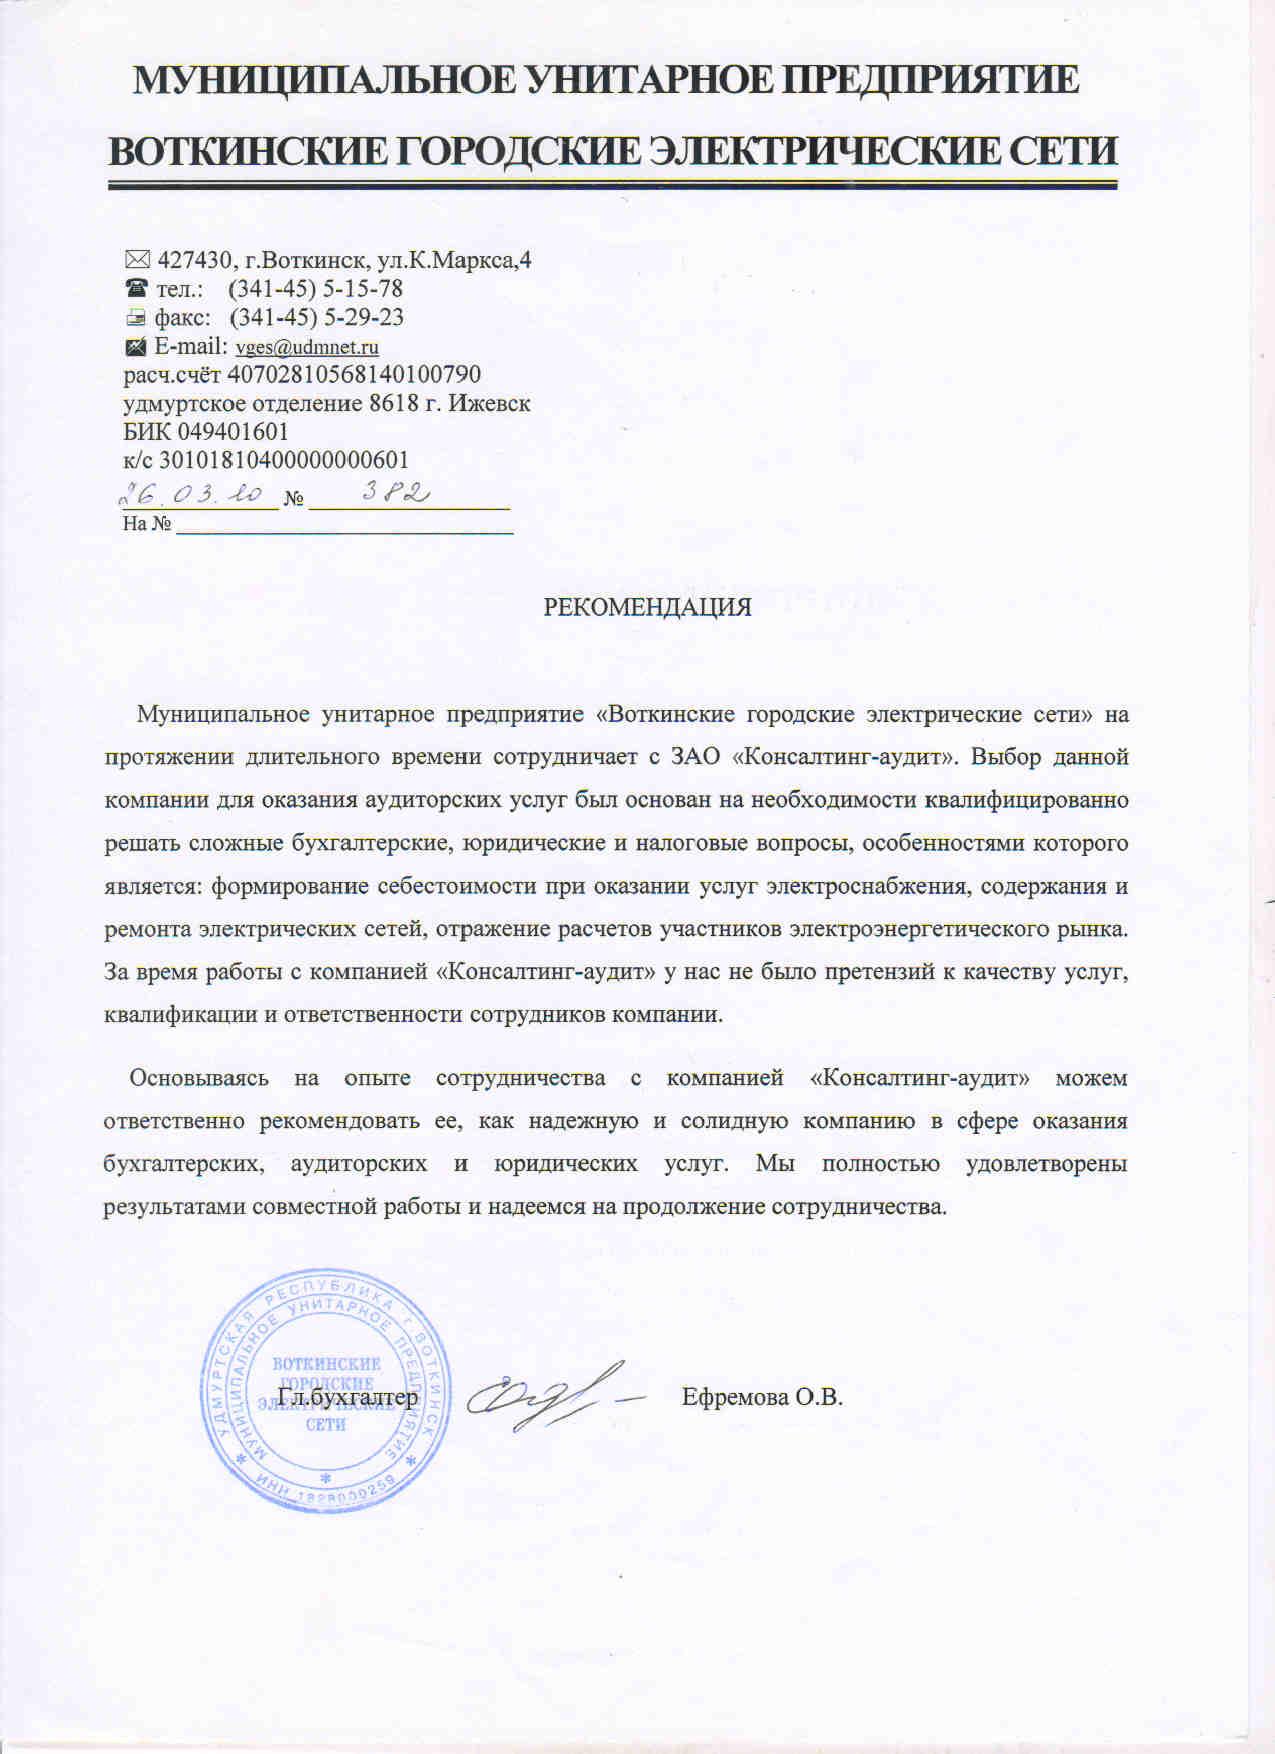 Рекомендация МУП ВГЭС_2010